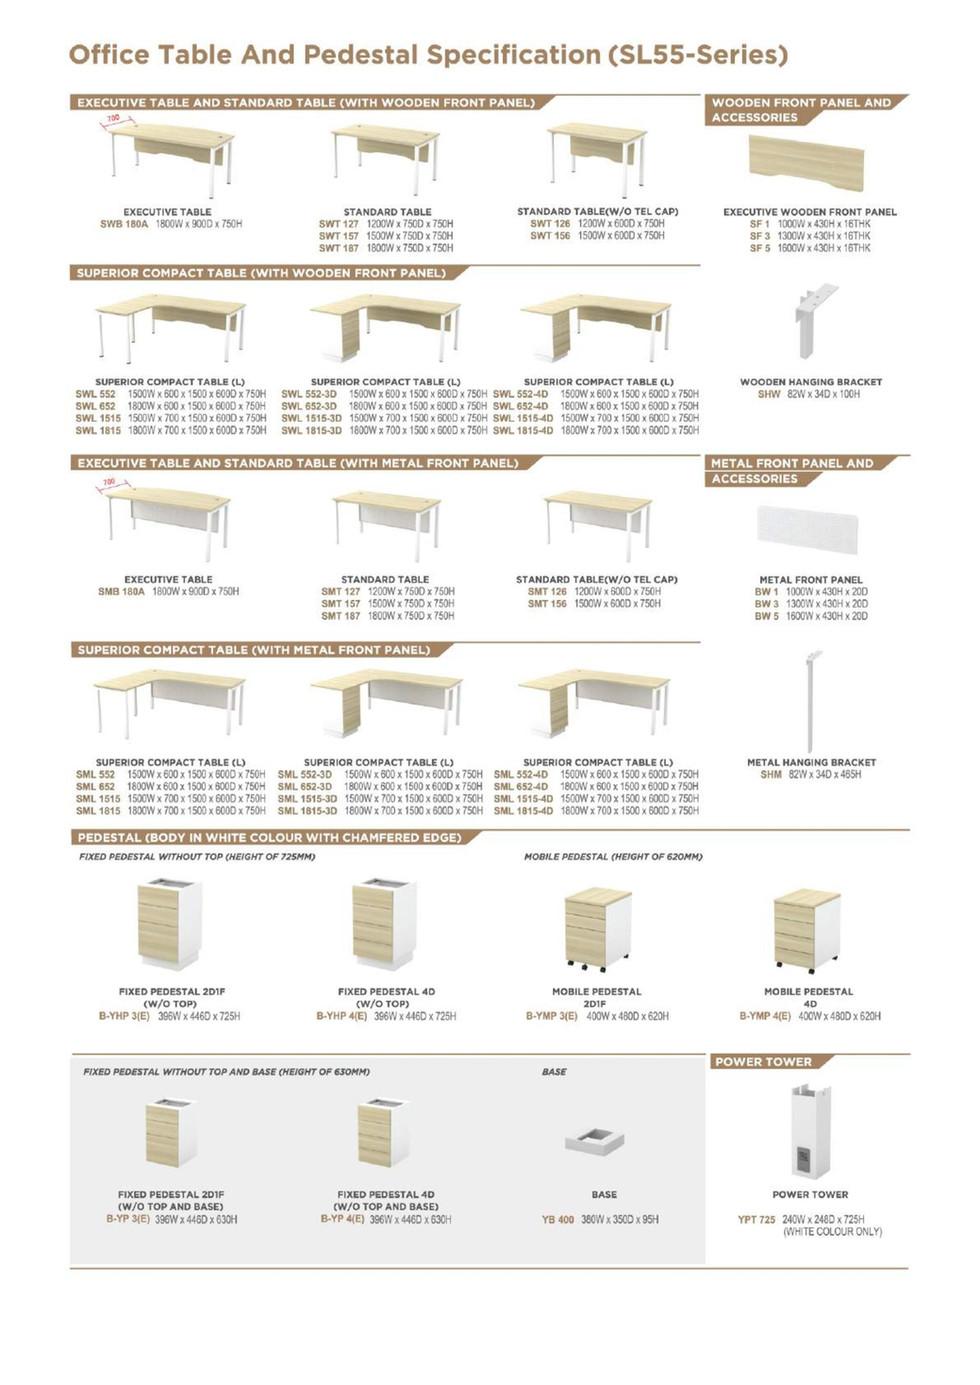 SL55-Catalog-page-010.jpg